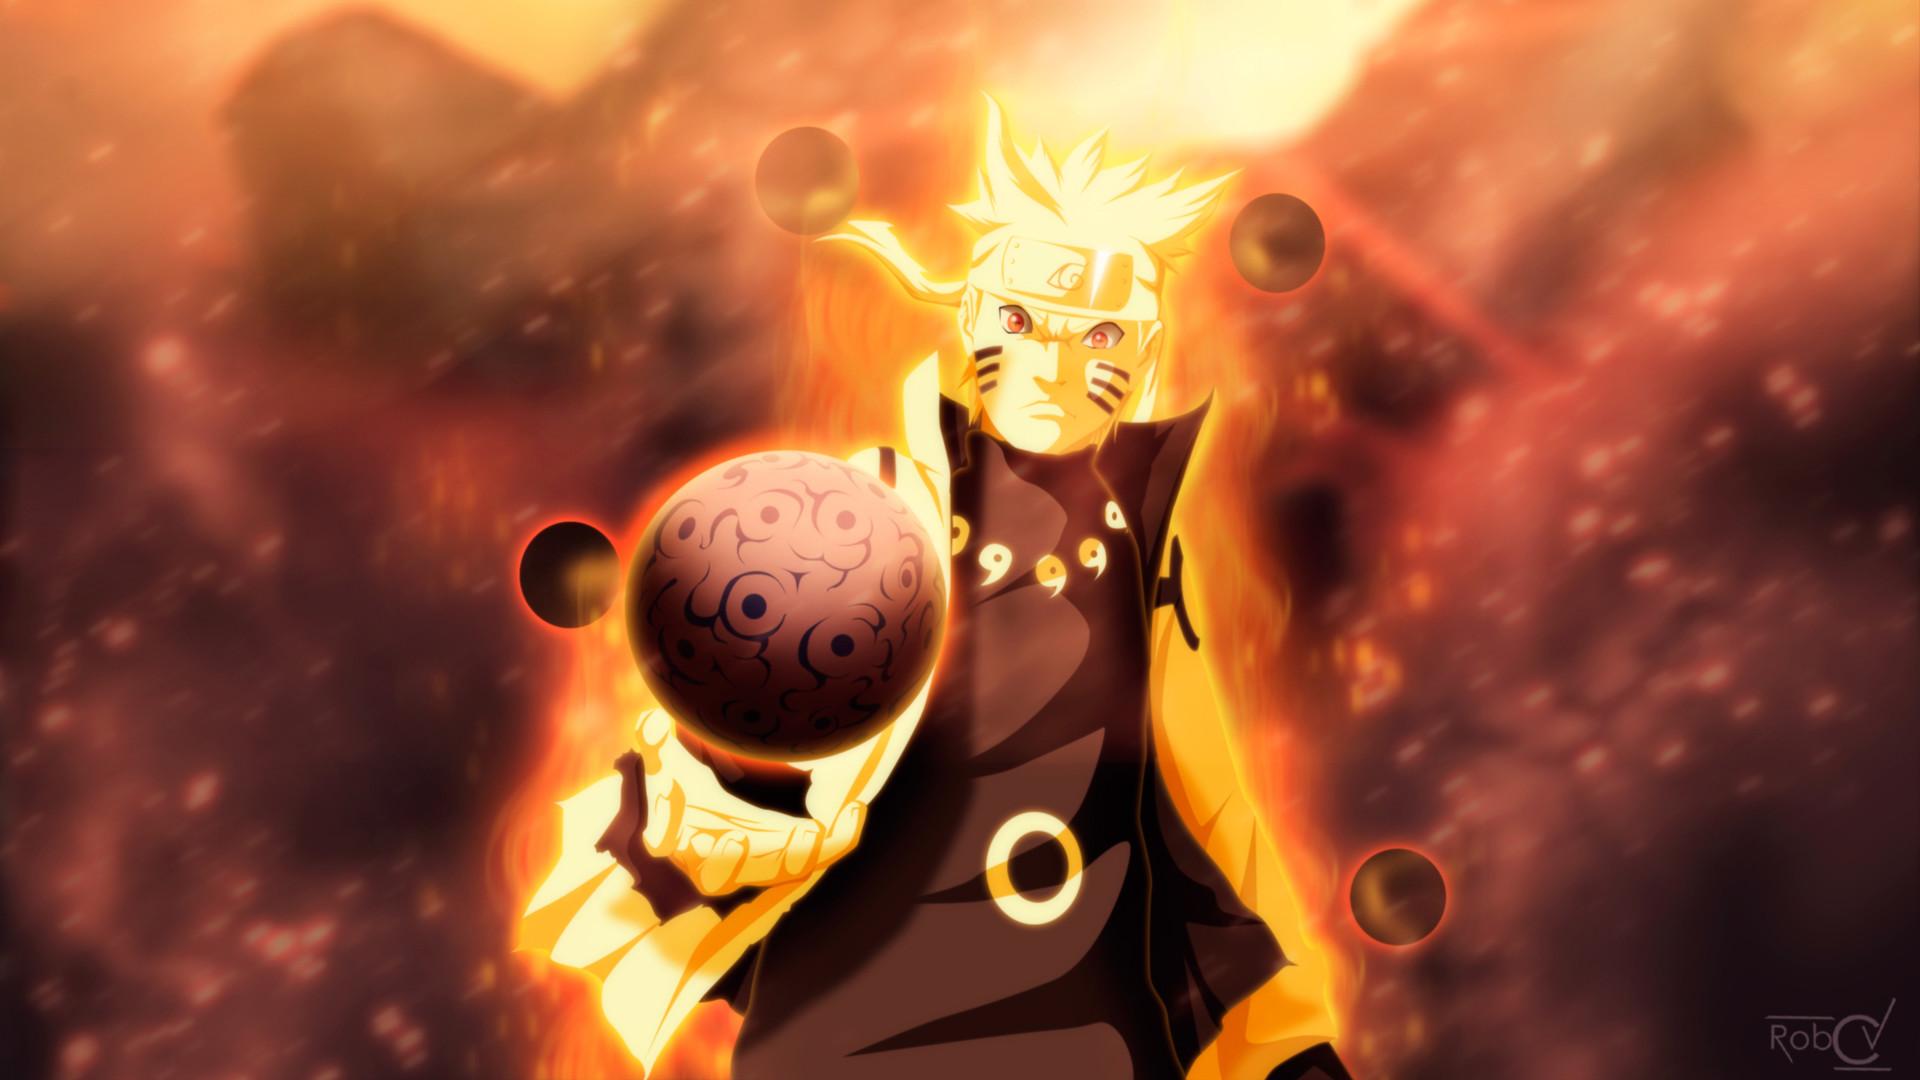 Good Wallpaper Naruto Fox - 594928-vertical-naruto-nine-tailed-fox-wallpaper-1920x1080-htc  Graphic_355865.jpg?resize\u003d1920%2C1080\u0026ssl\u003d1